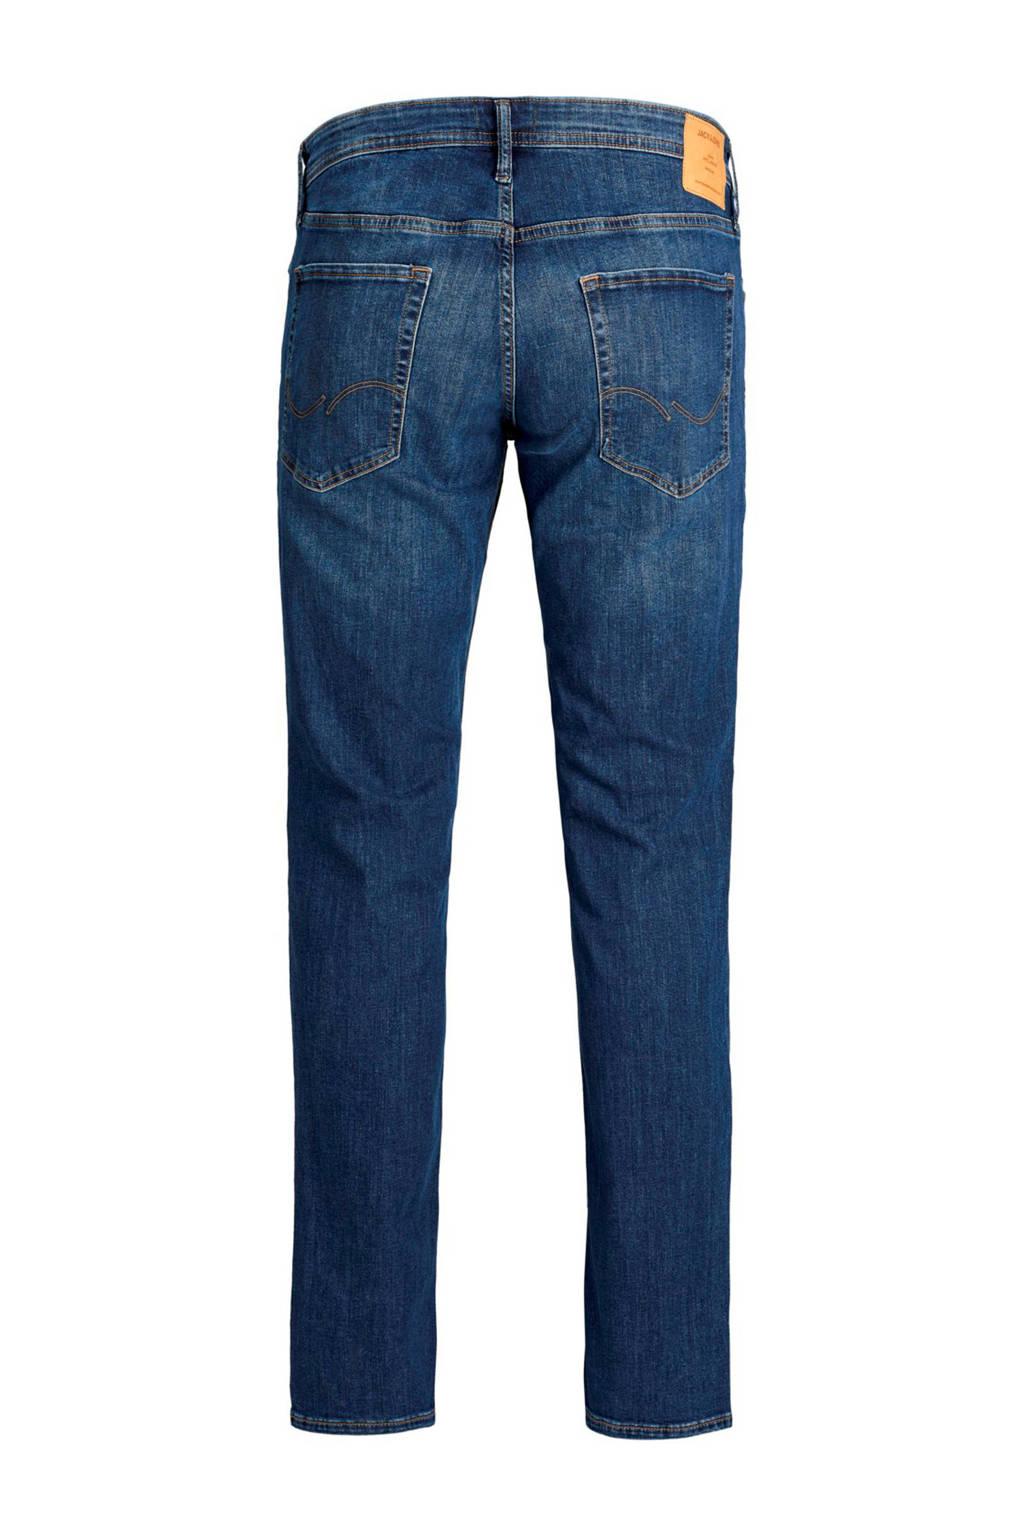 JACK & JONES PLUS SIZE slim fit jeans Jjitim Jjoriginal, Blue denim